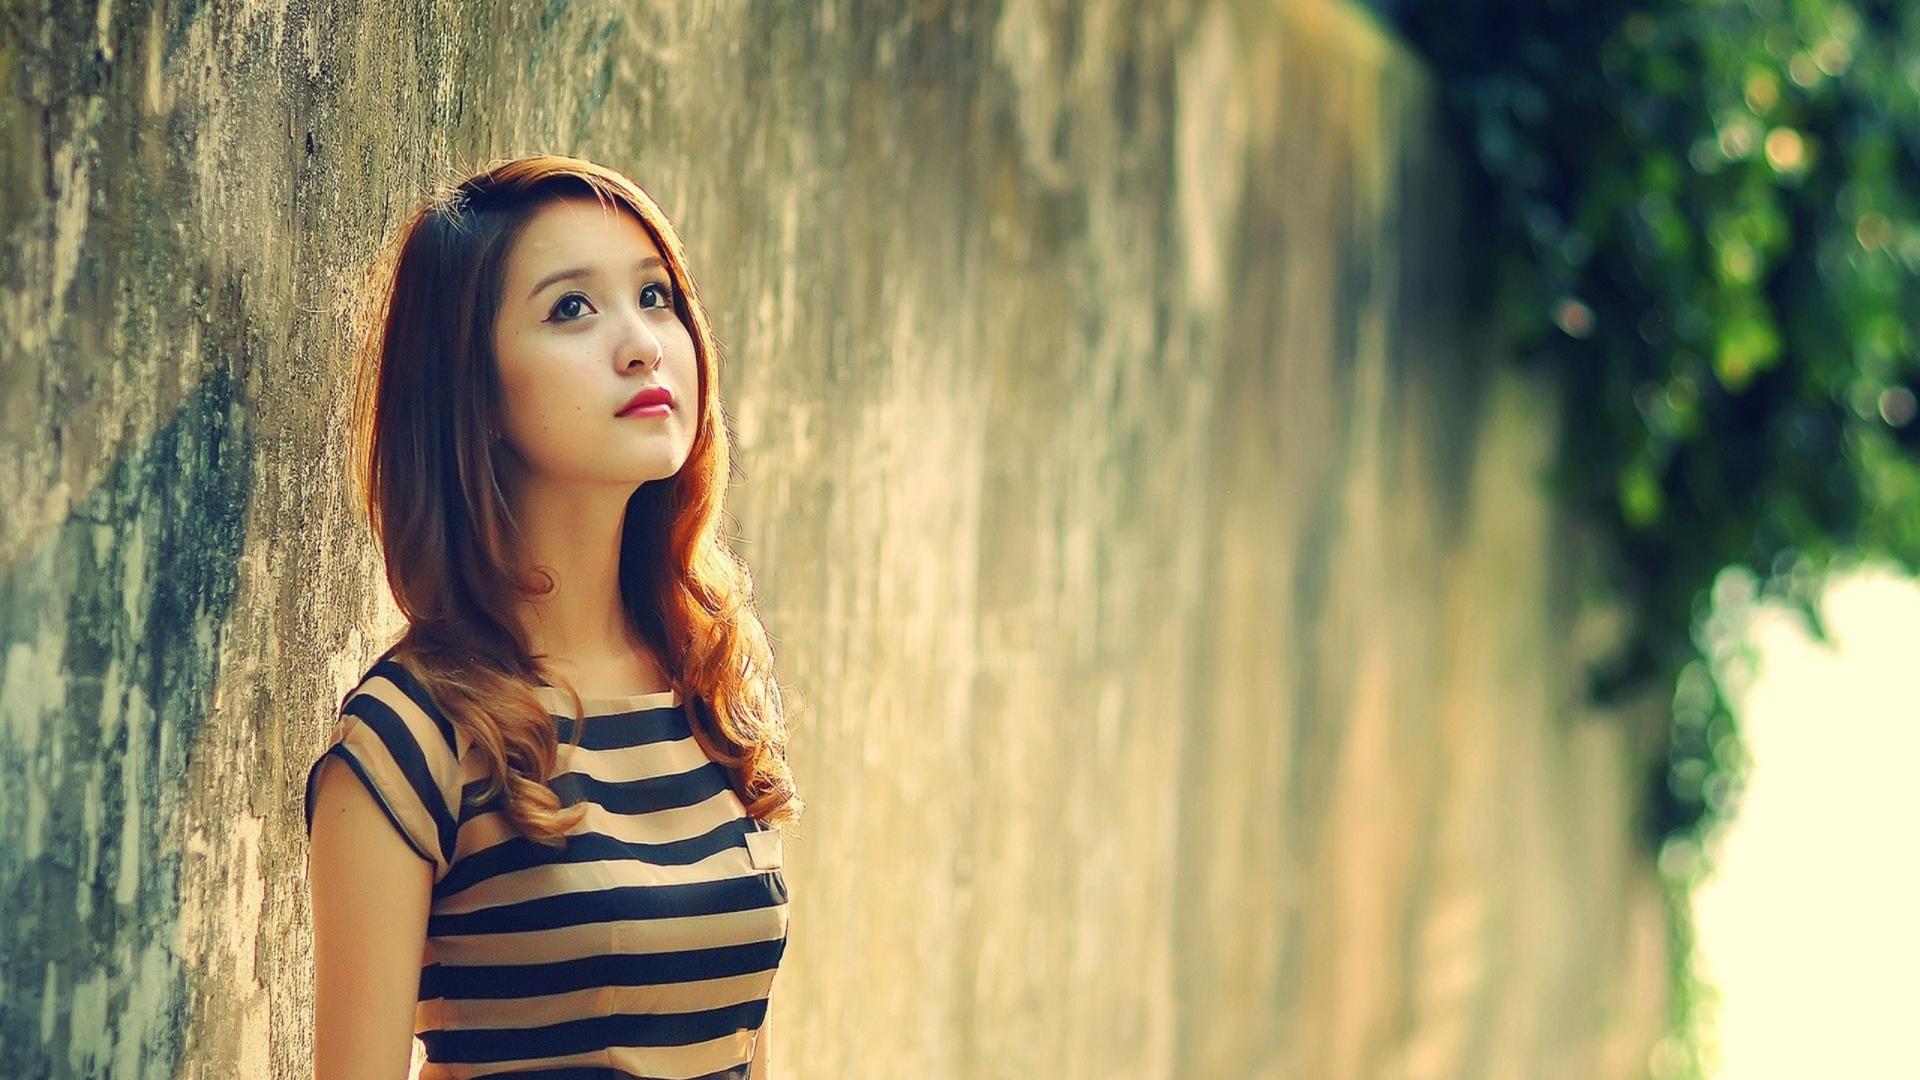 Full HD Wallpaper dreamy stone long hair blurry Desktop 1920x1080